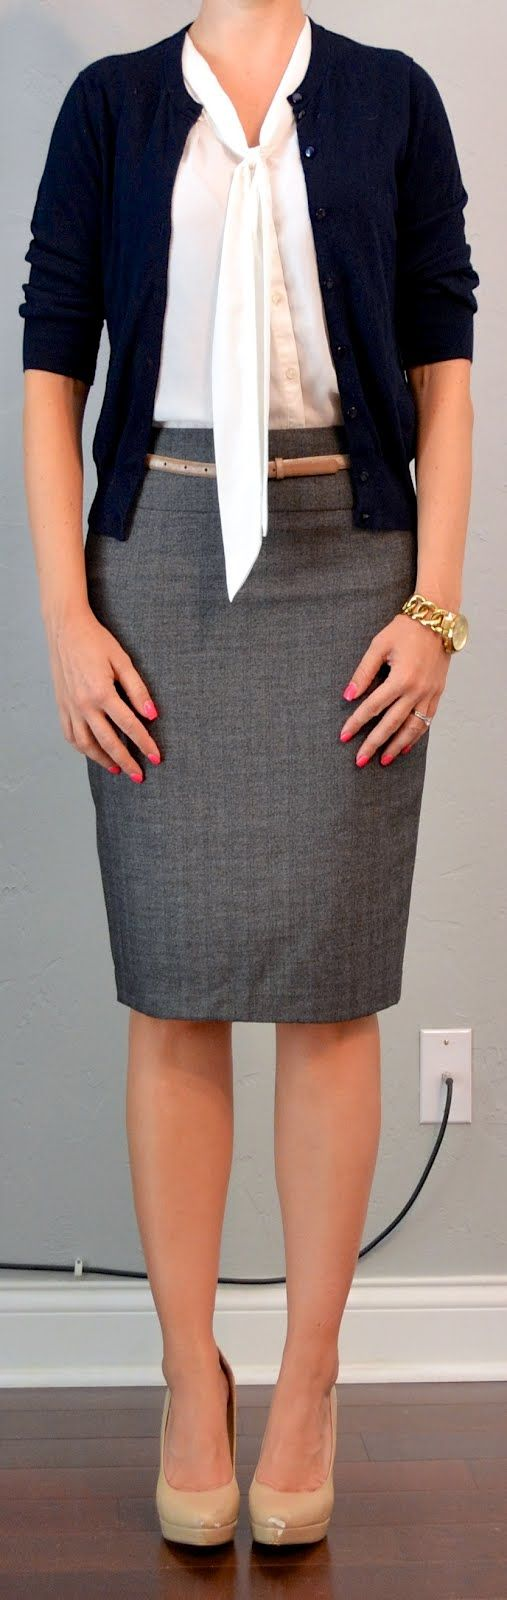 Best 25  Navy skirt outfit ideas on Pinterest | Navy skirt, Midi ...